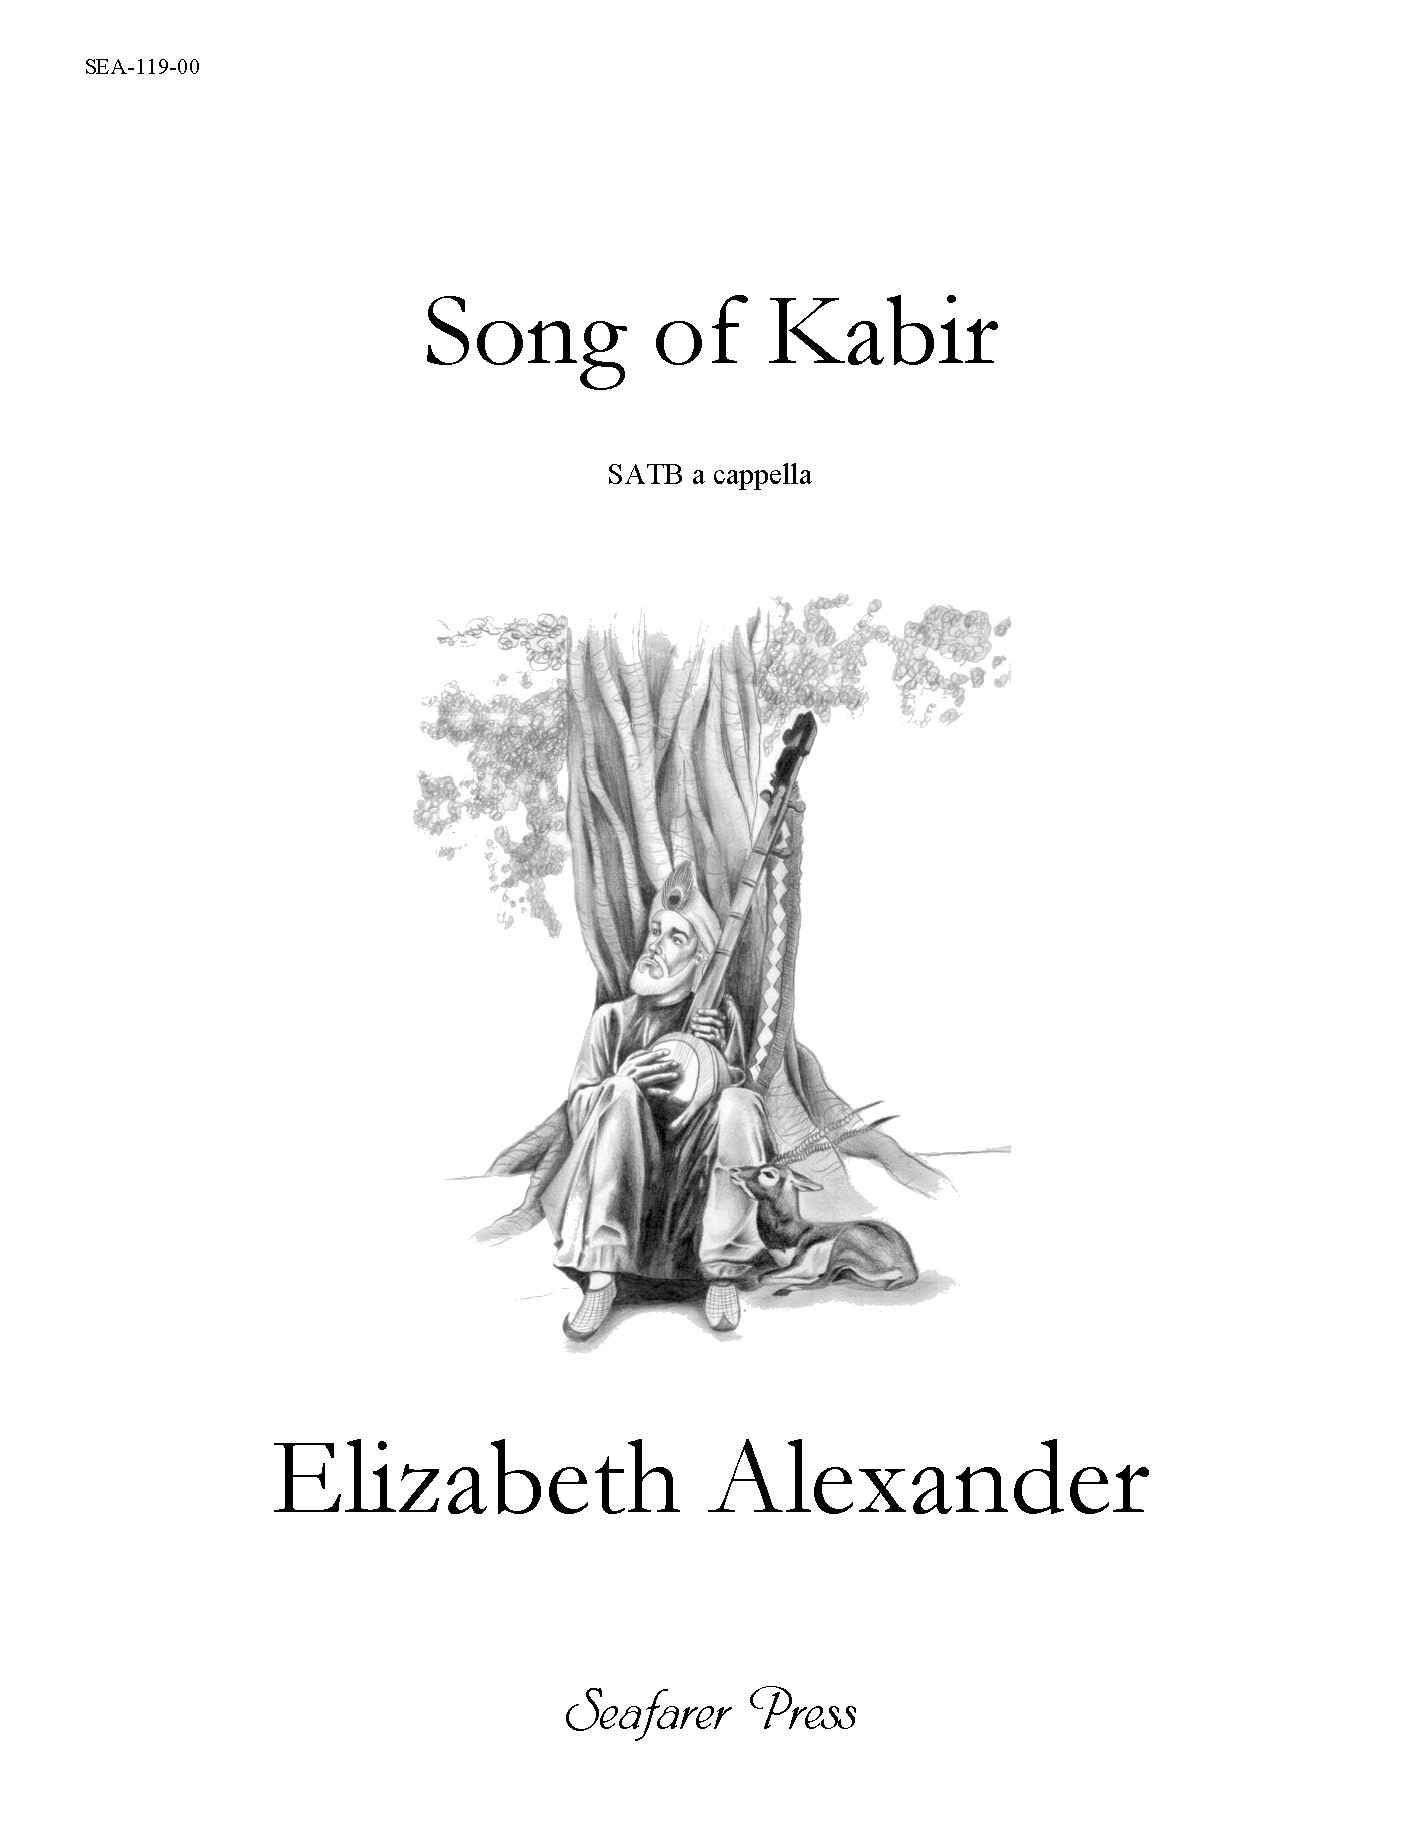 SEA-119-00 - Song of Kabir